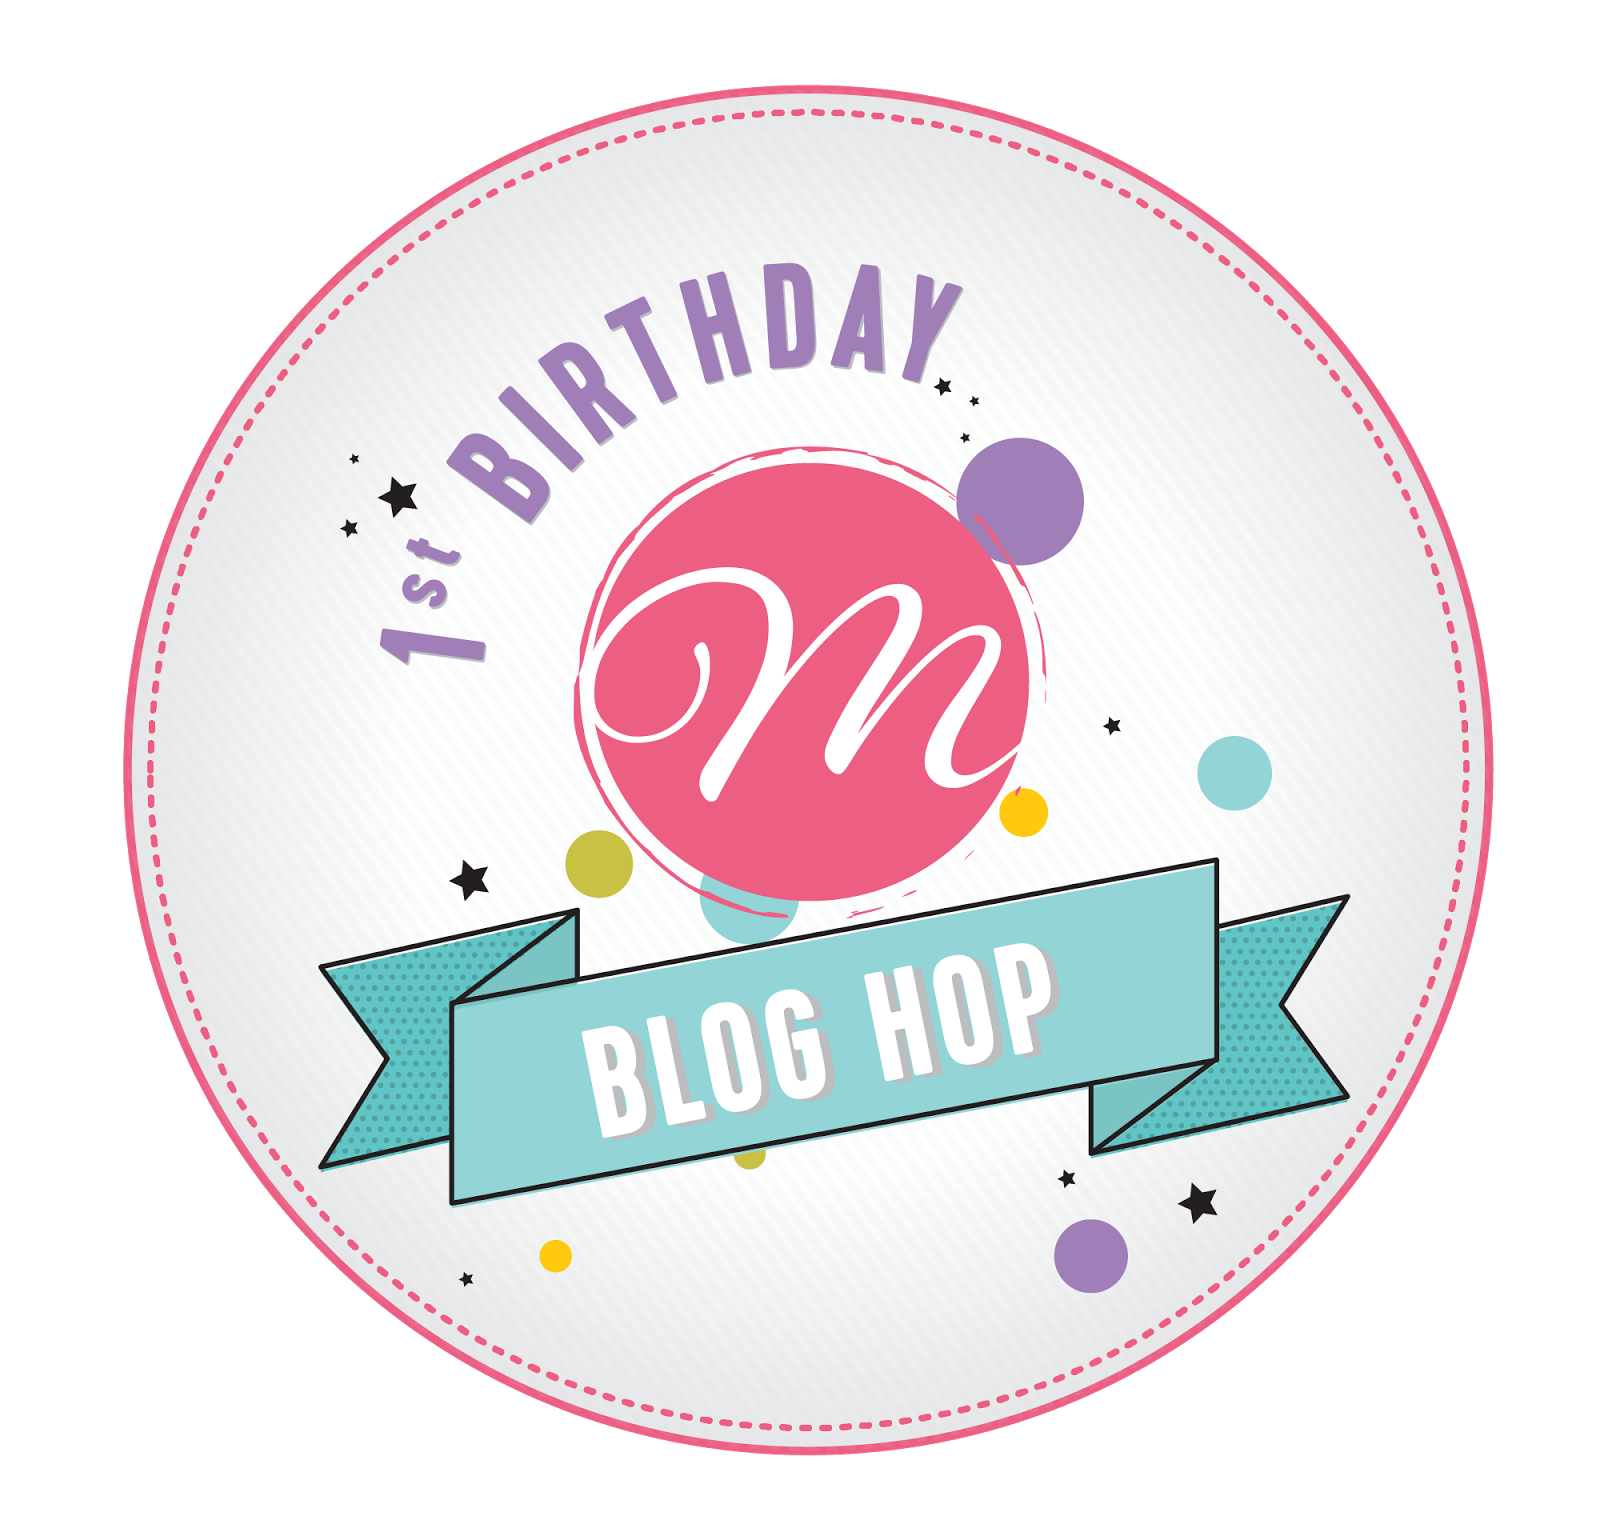 Mudra Blog Hop